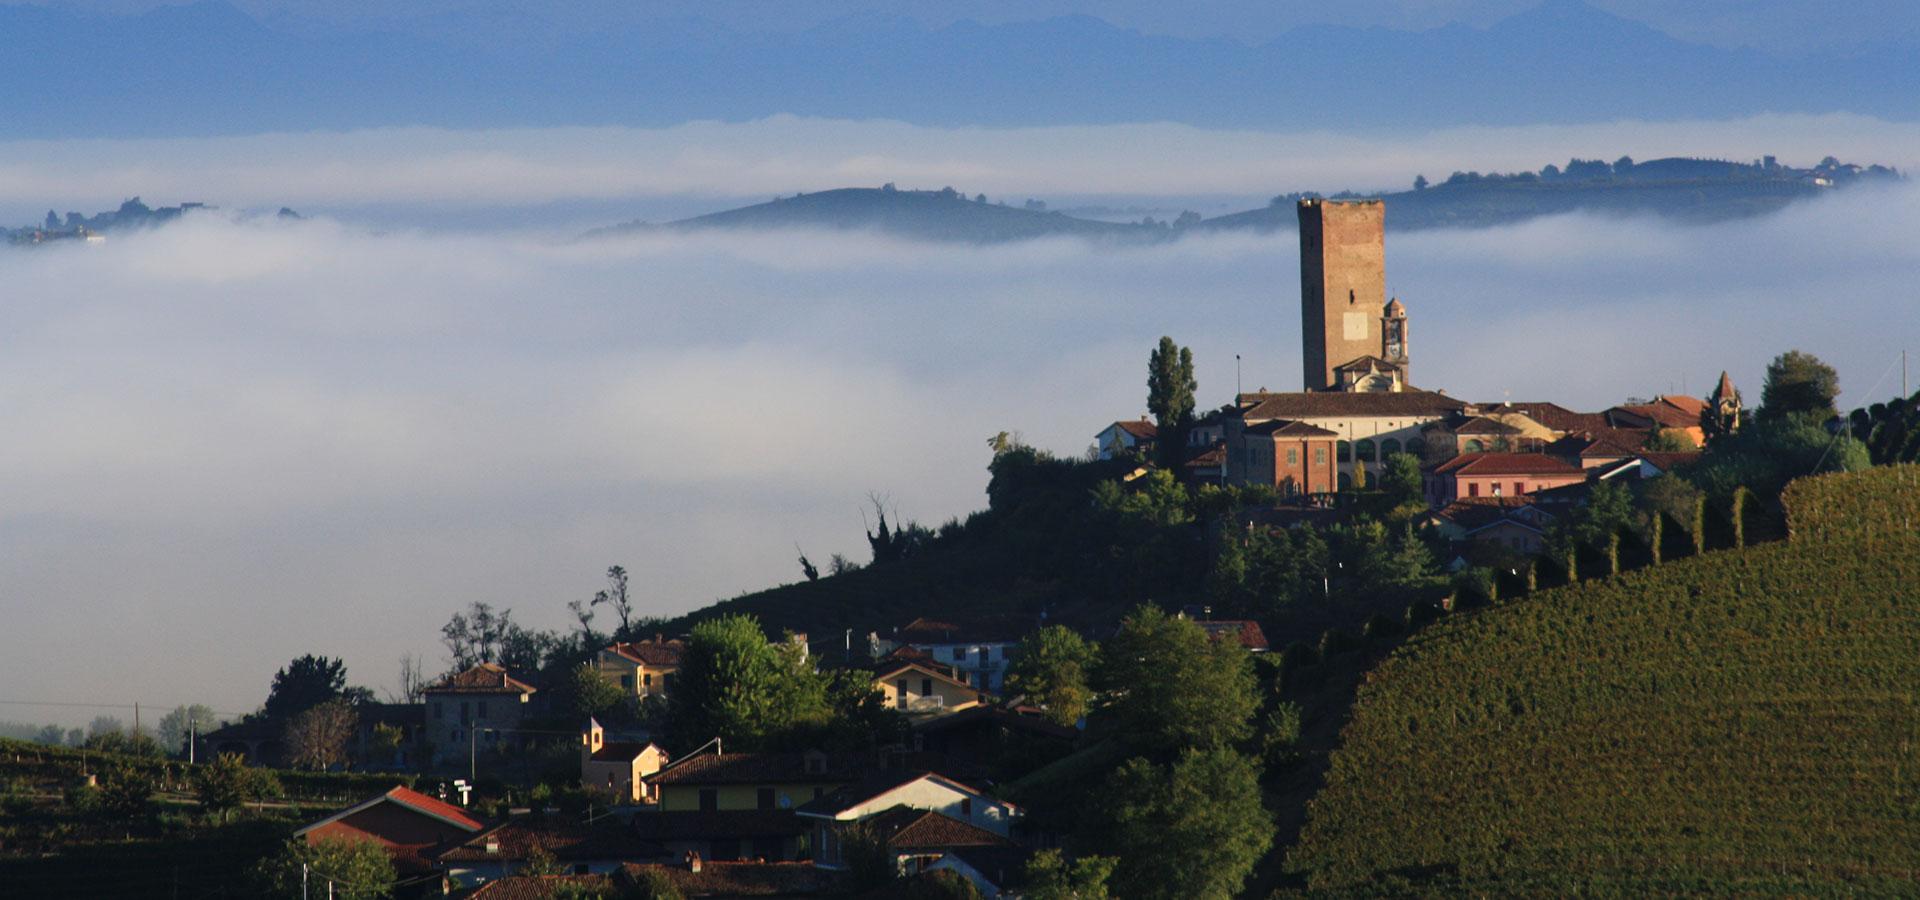 Torre-di-barbaresco-4